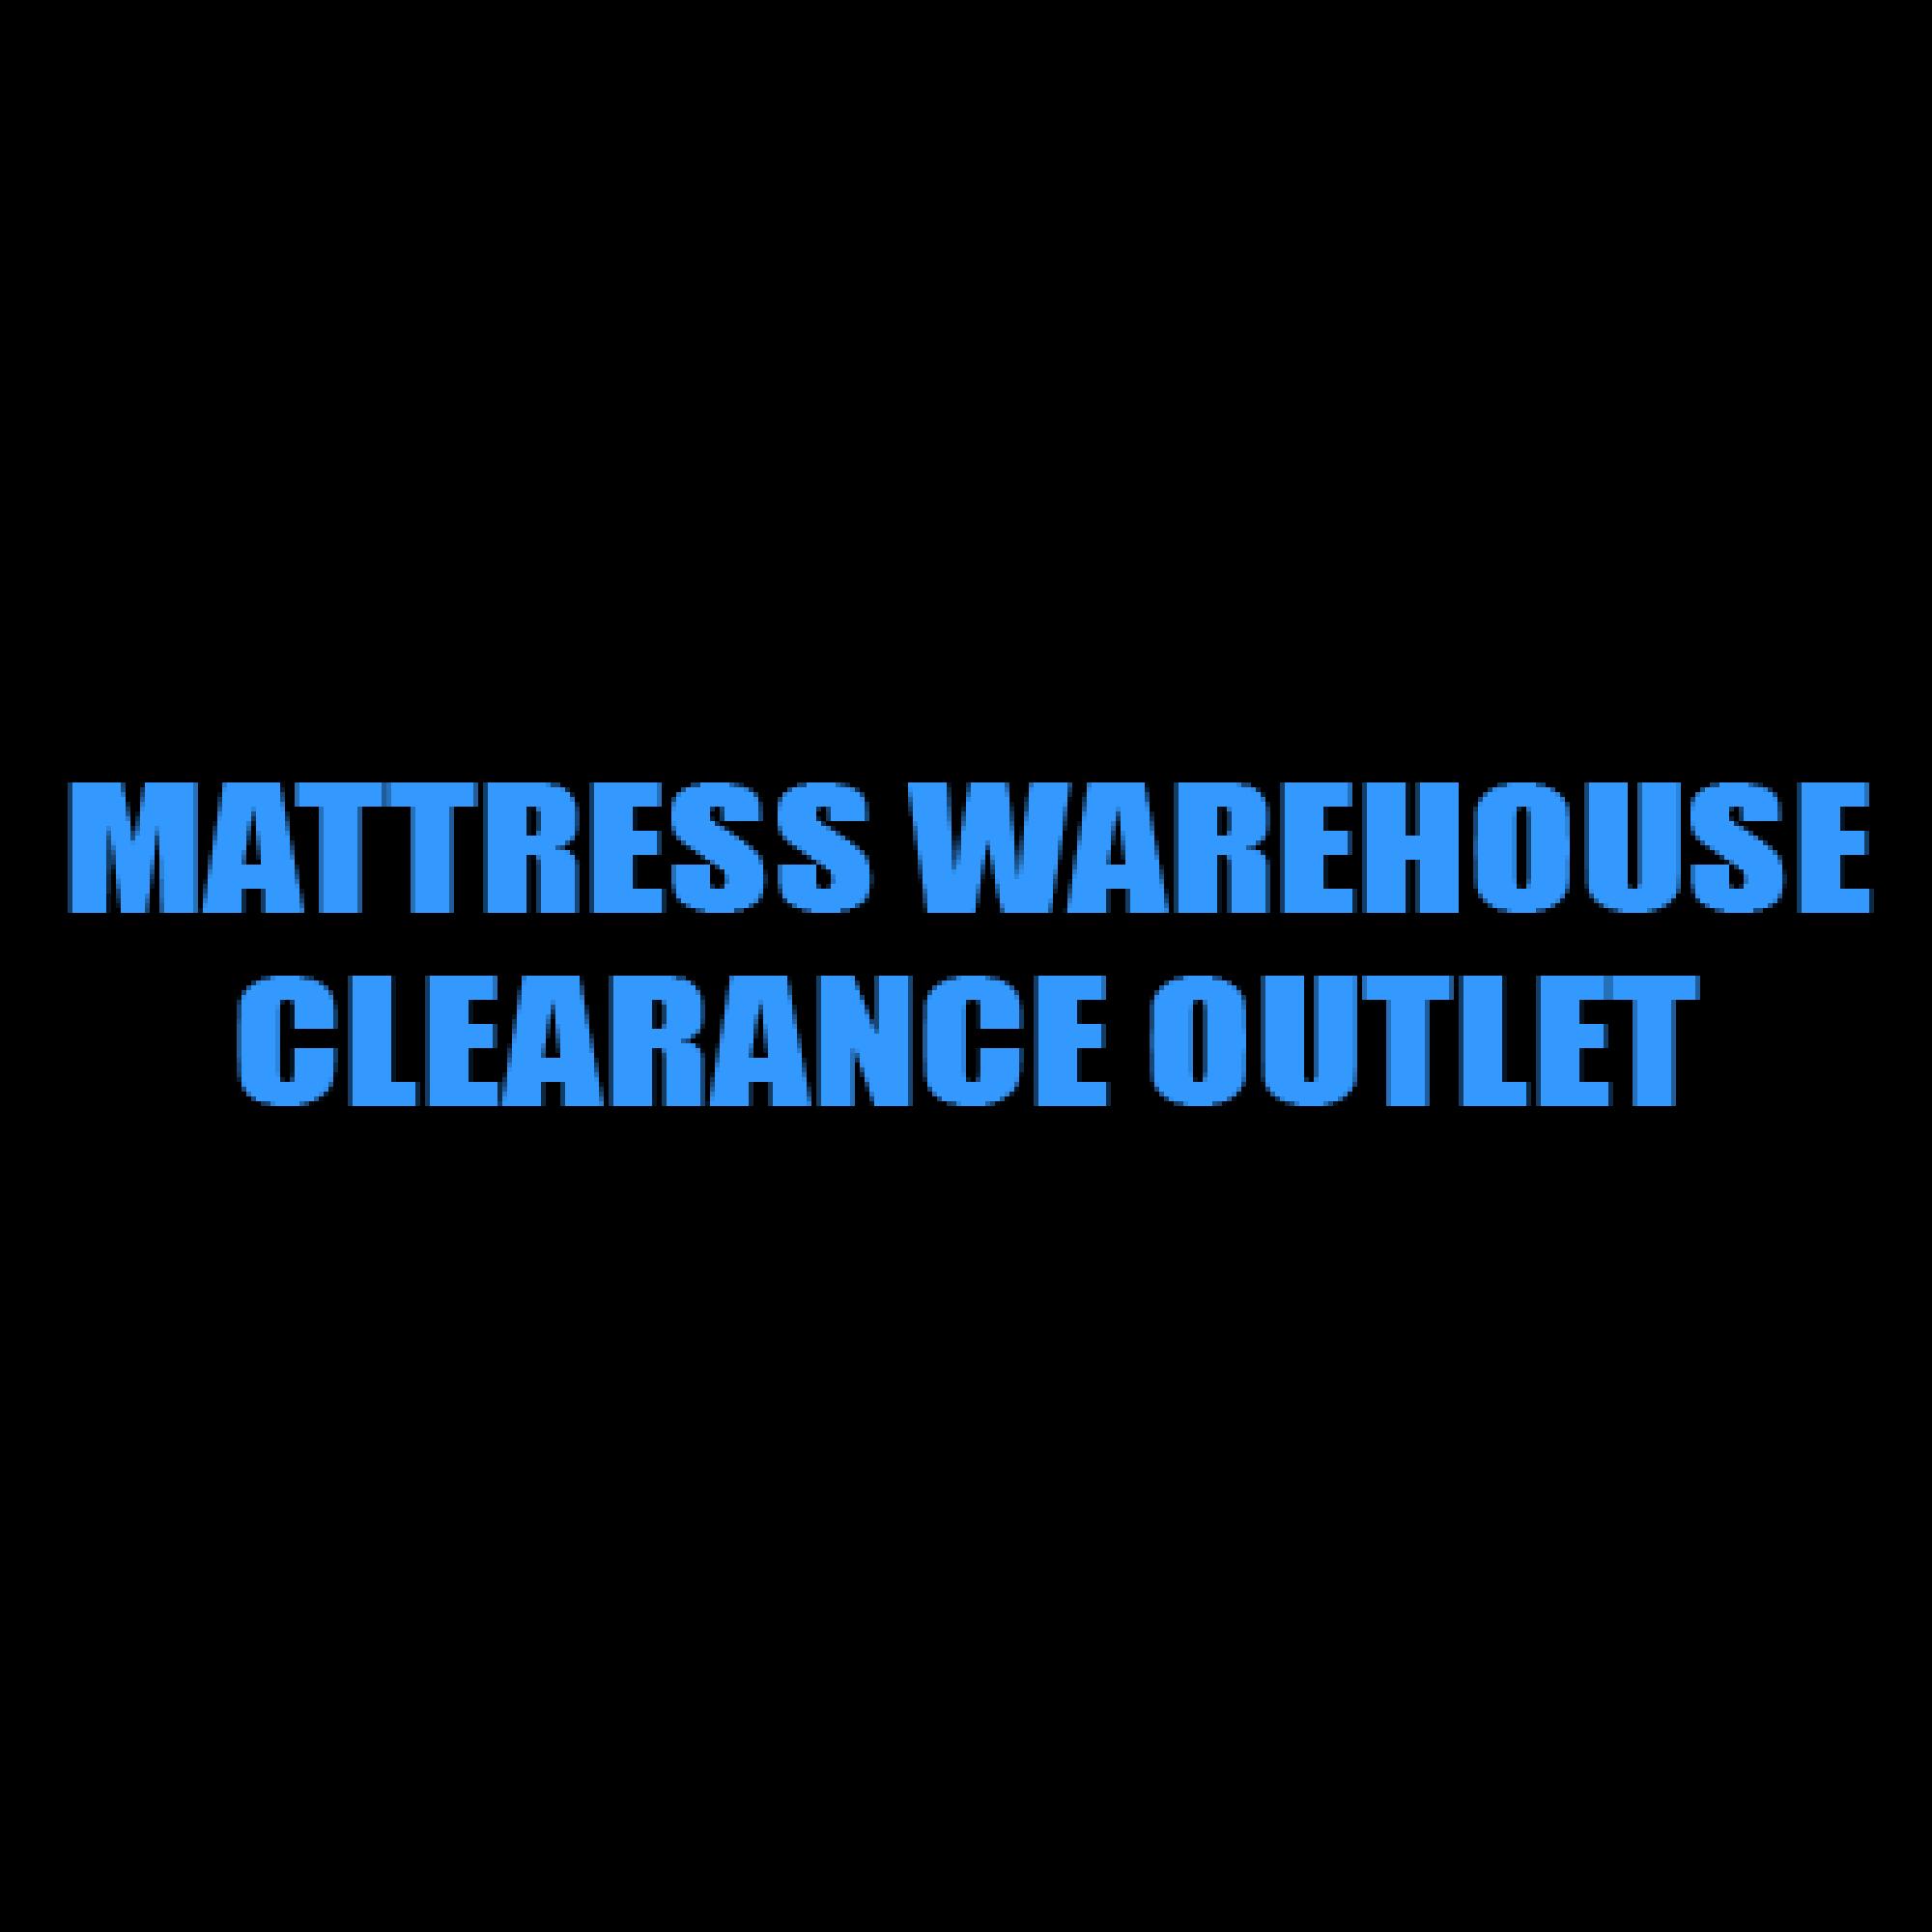 mattress warehouse clearance outlet 9357 greenback ln orangevale